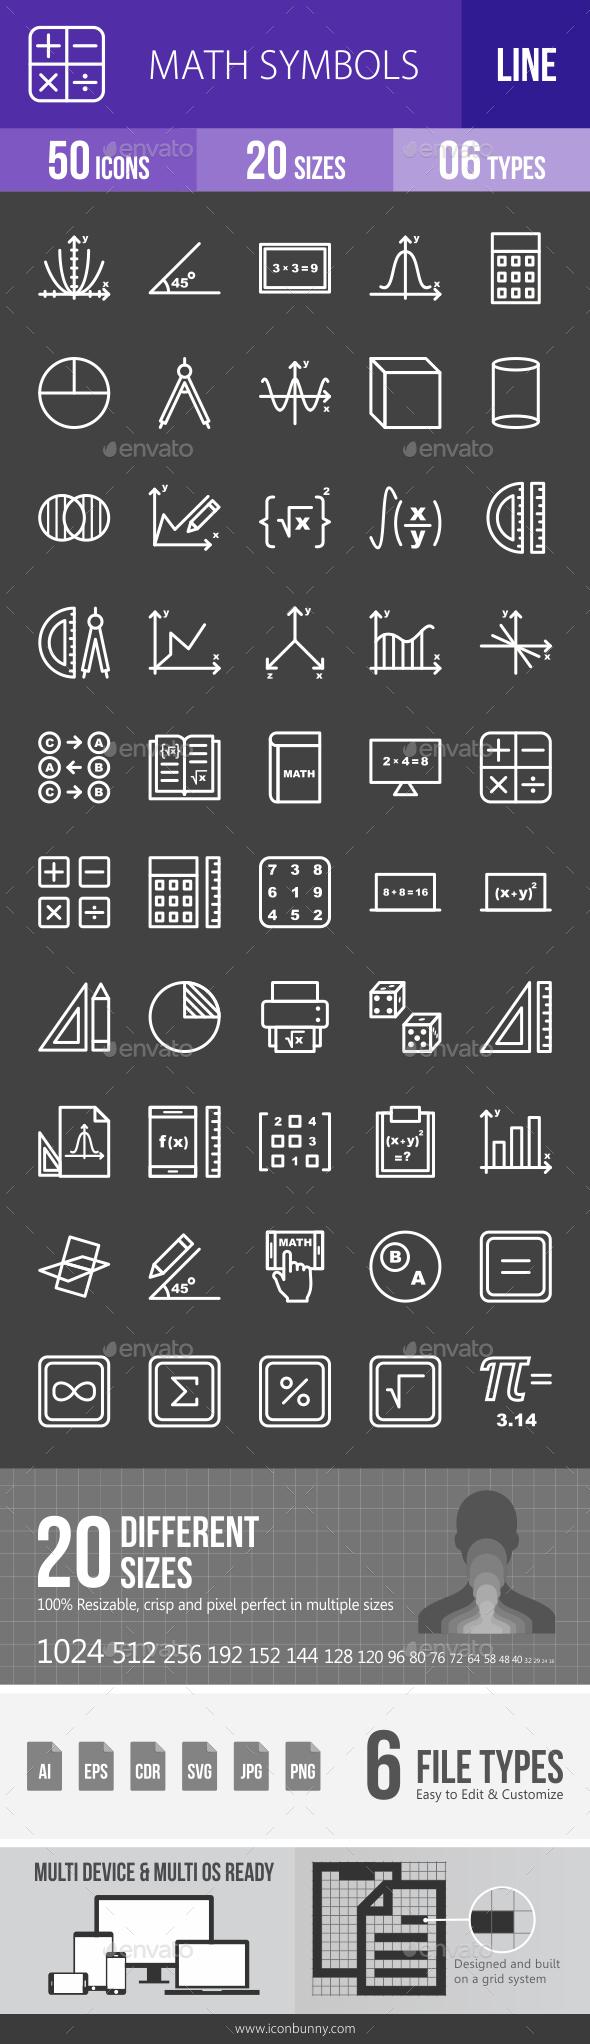 Math Symbols Line Inverted Icons Maths Symbols And Icons